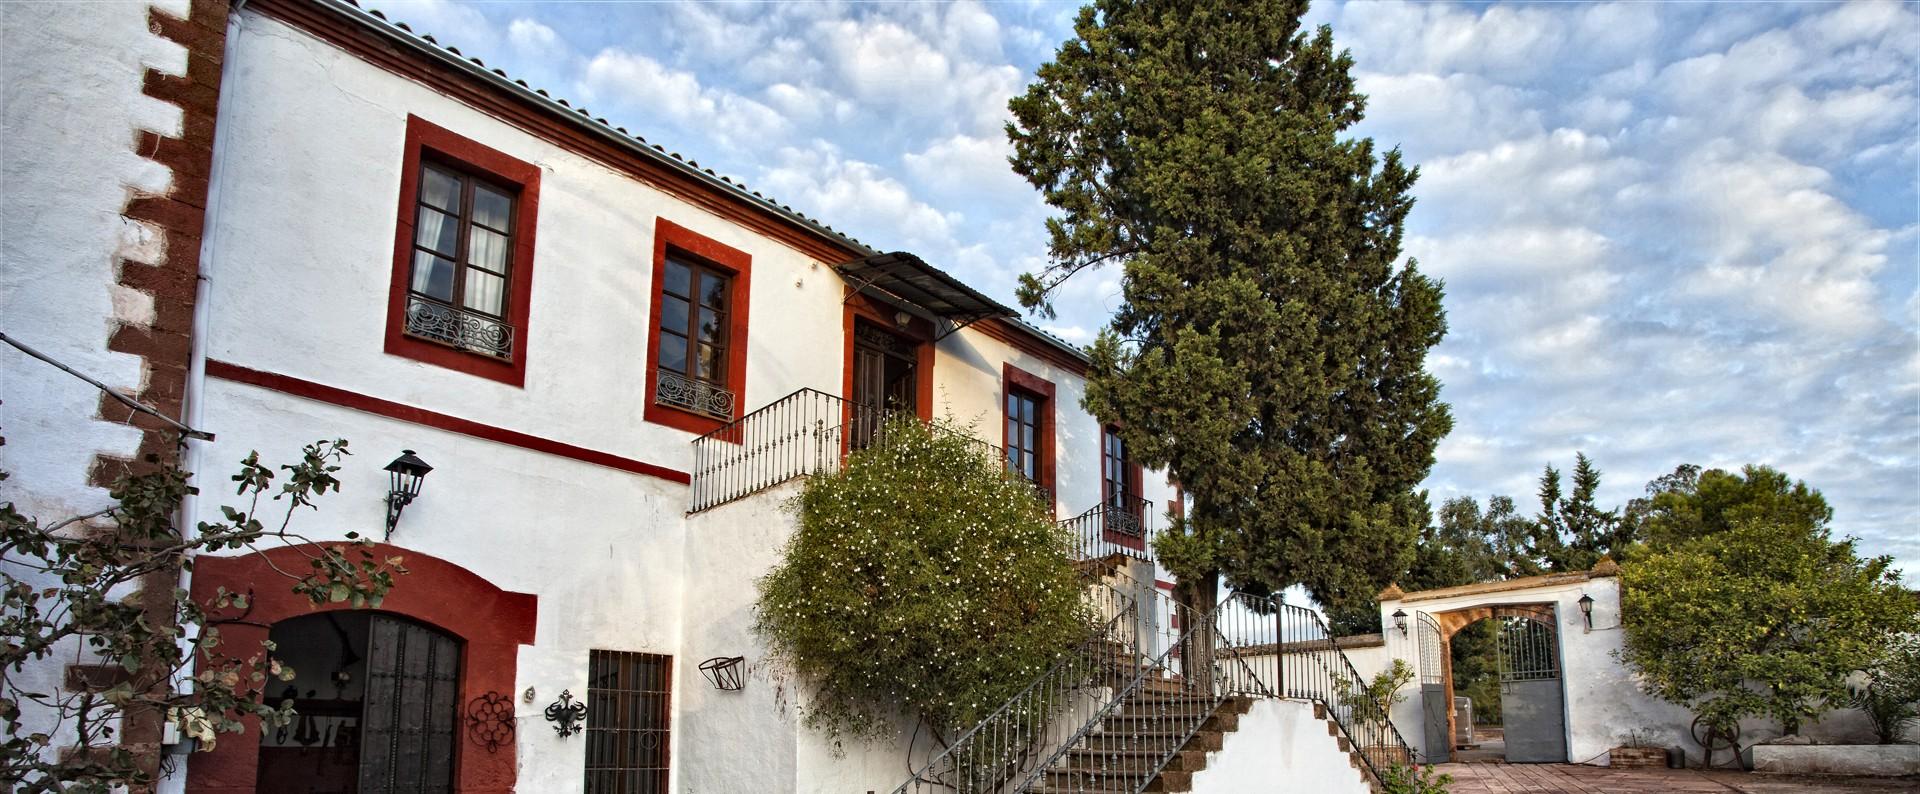 Casa Cárdenes-Quirós